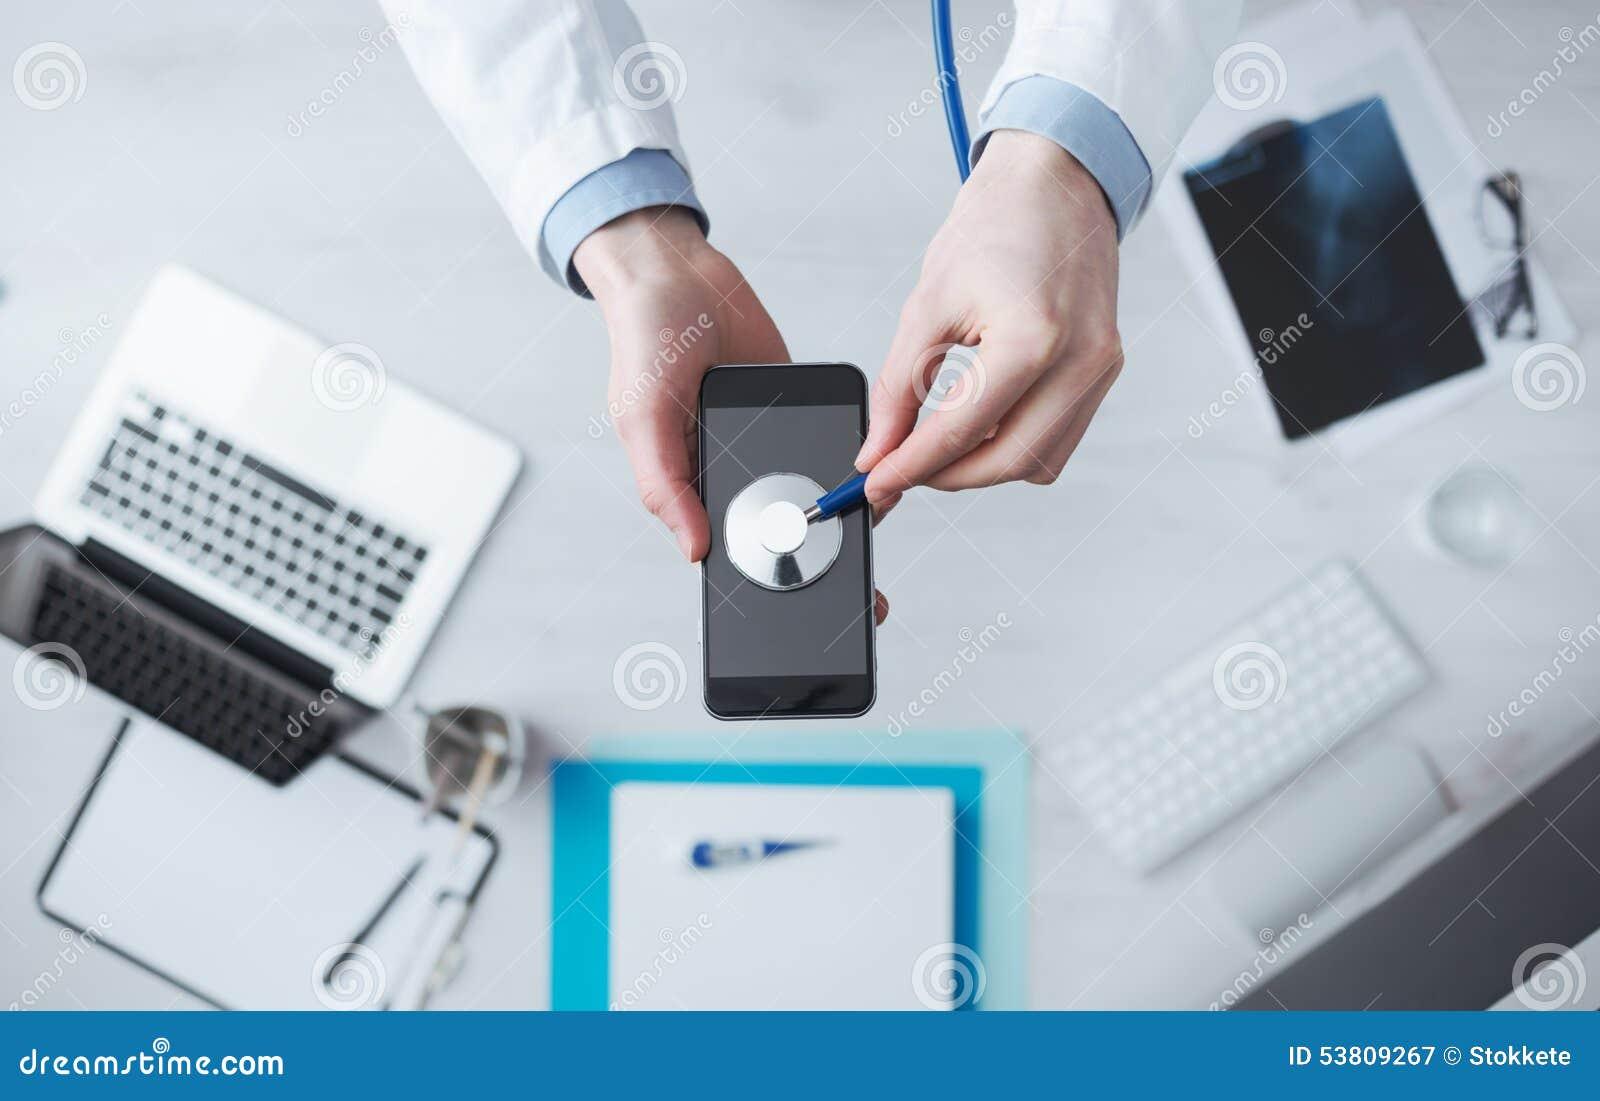 Insurance Mobile Phone